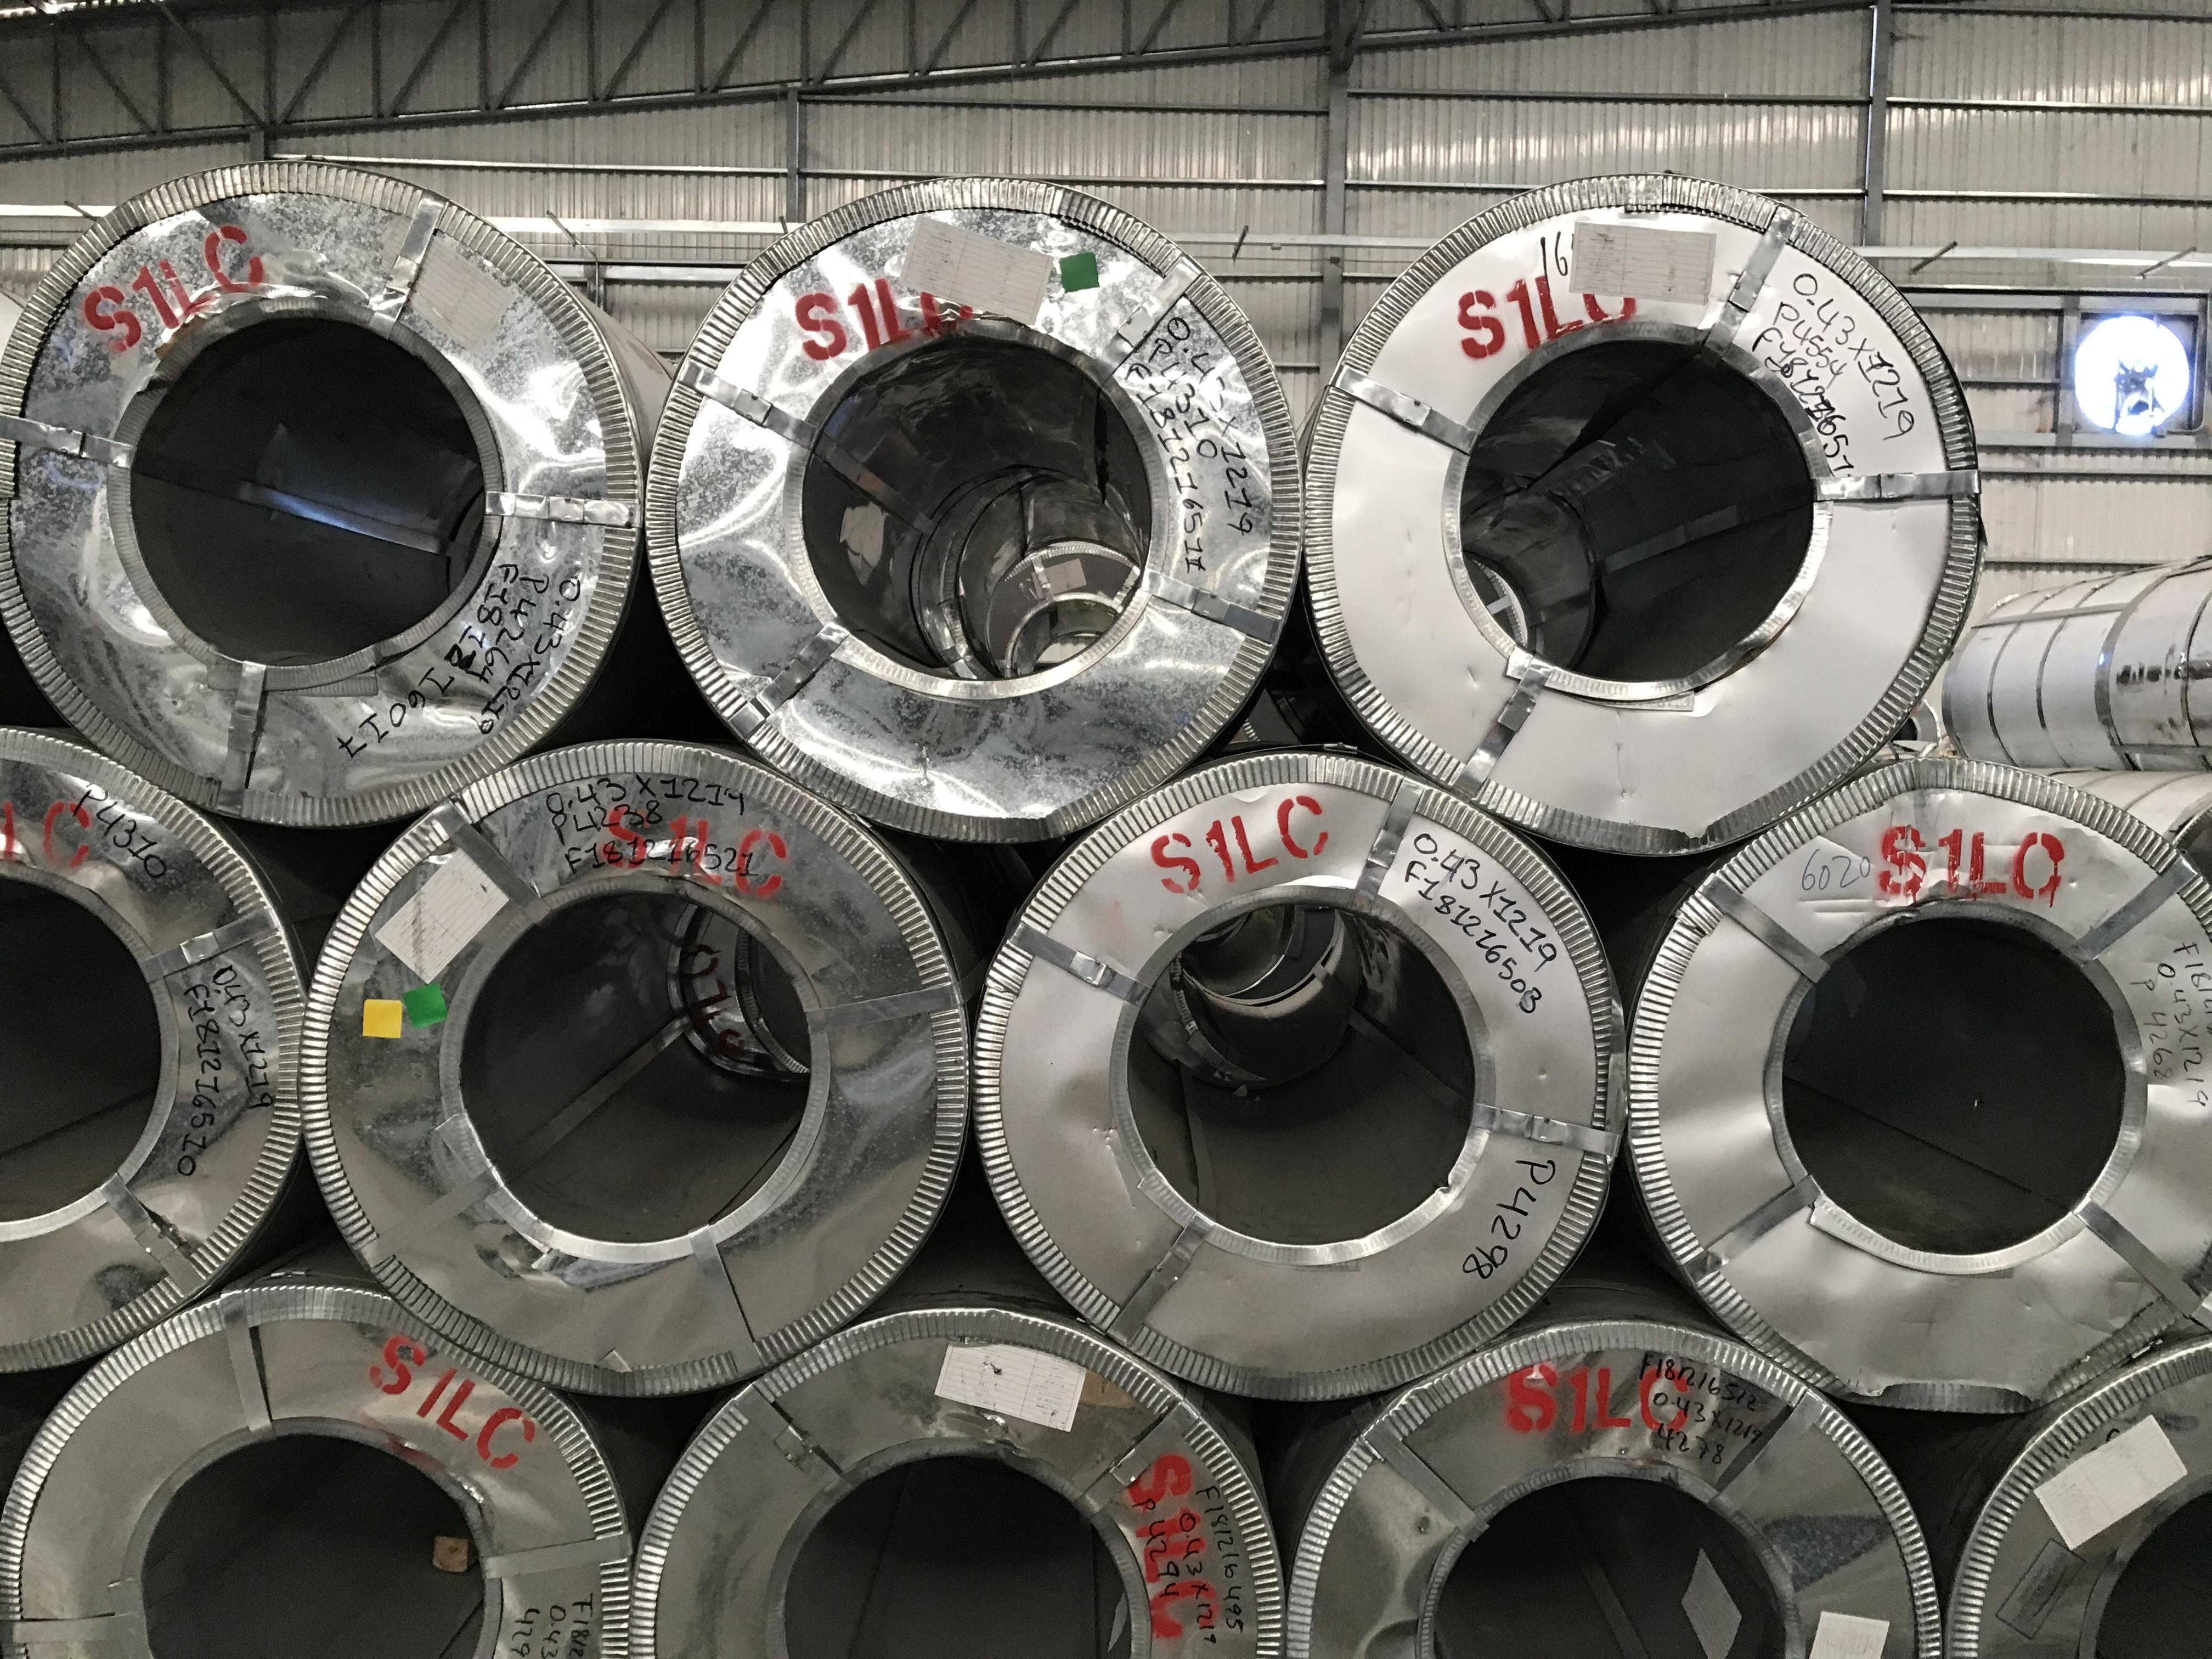 File:Leeco Steel Trading coils jpg - Wikimedia Commons